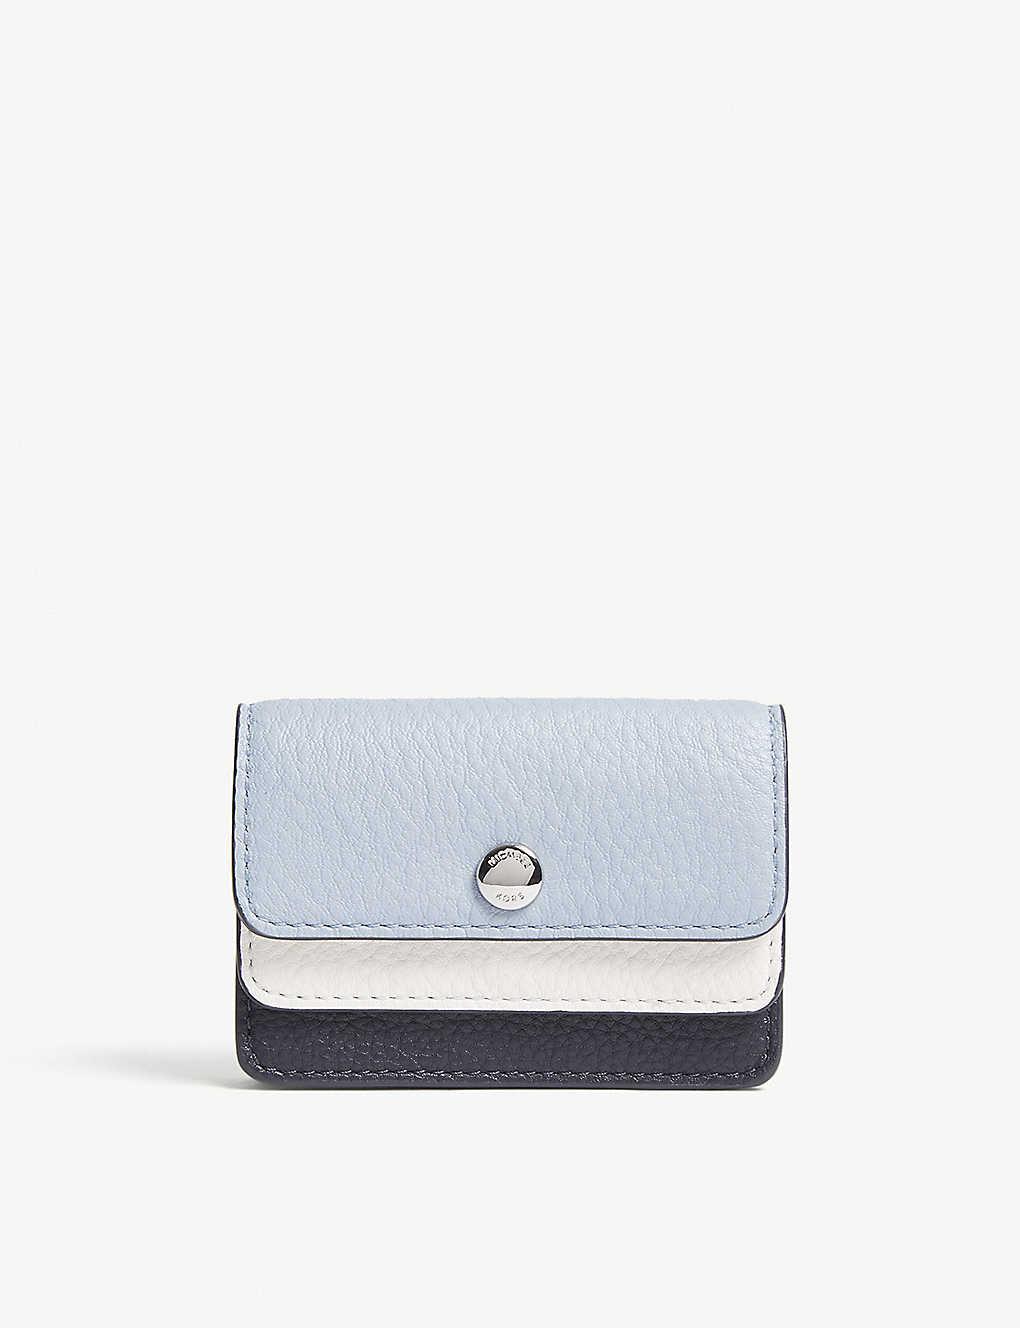 506b6f2d44e689 MICHAEL MICHAEL KORS - Money Pieces double-flap small leather card ...